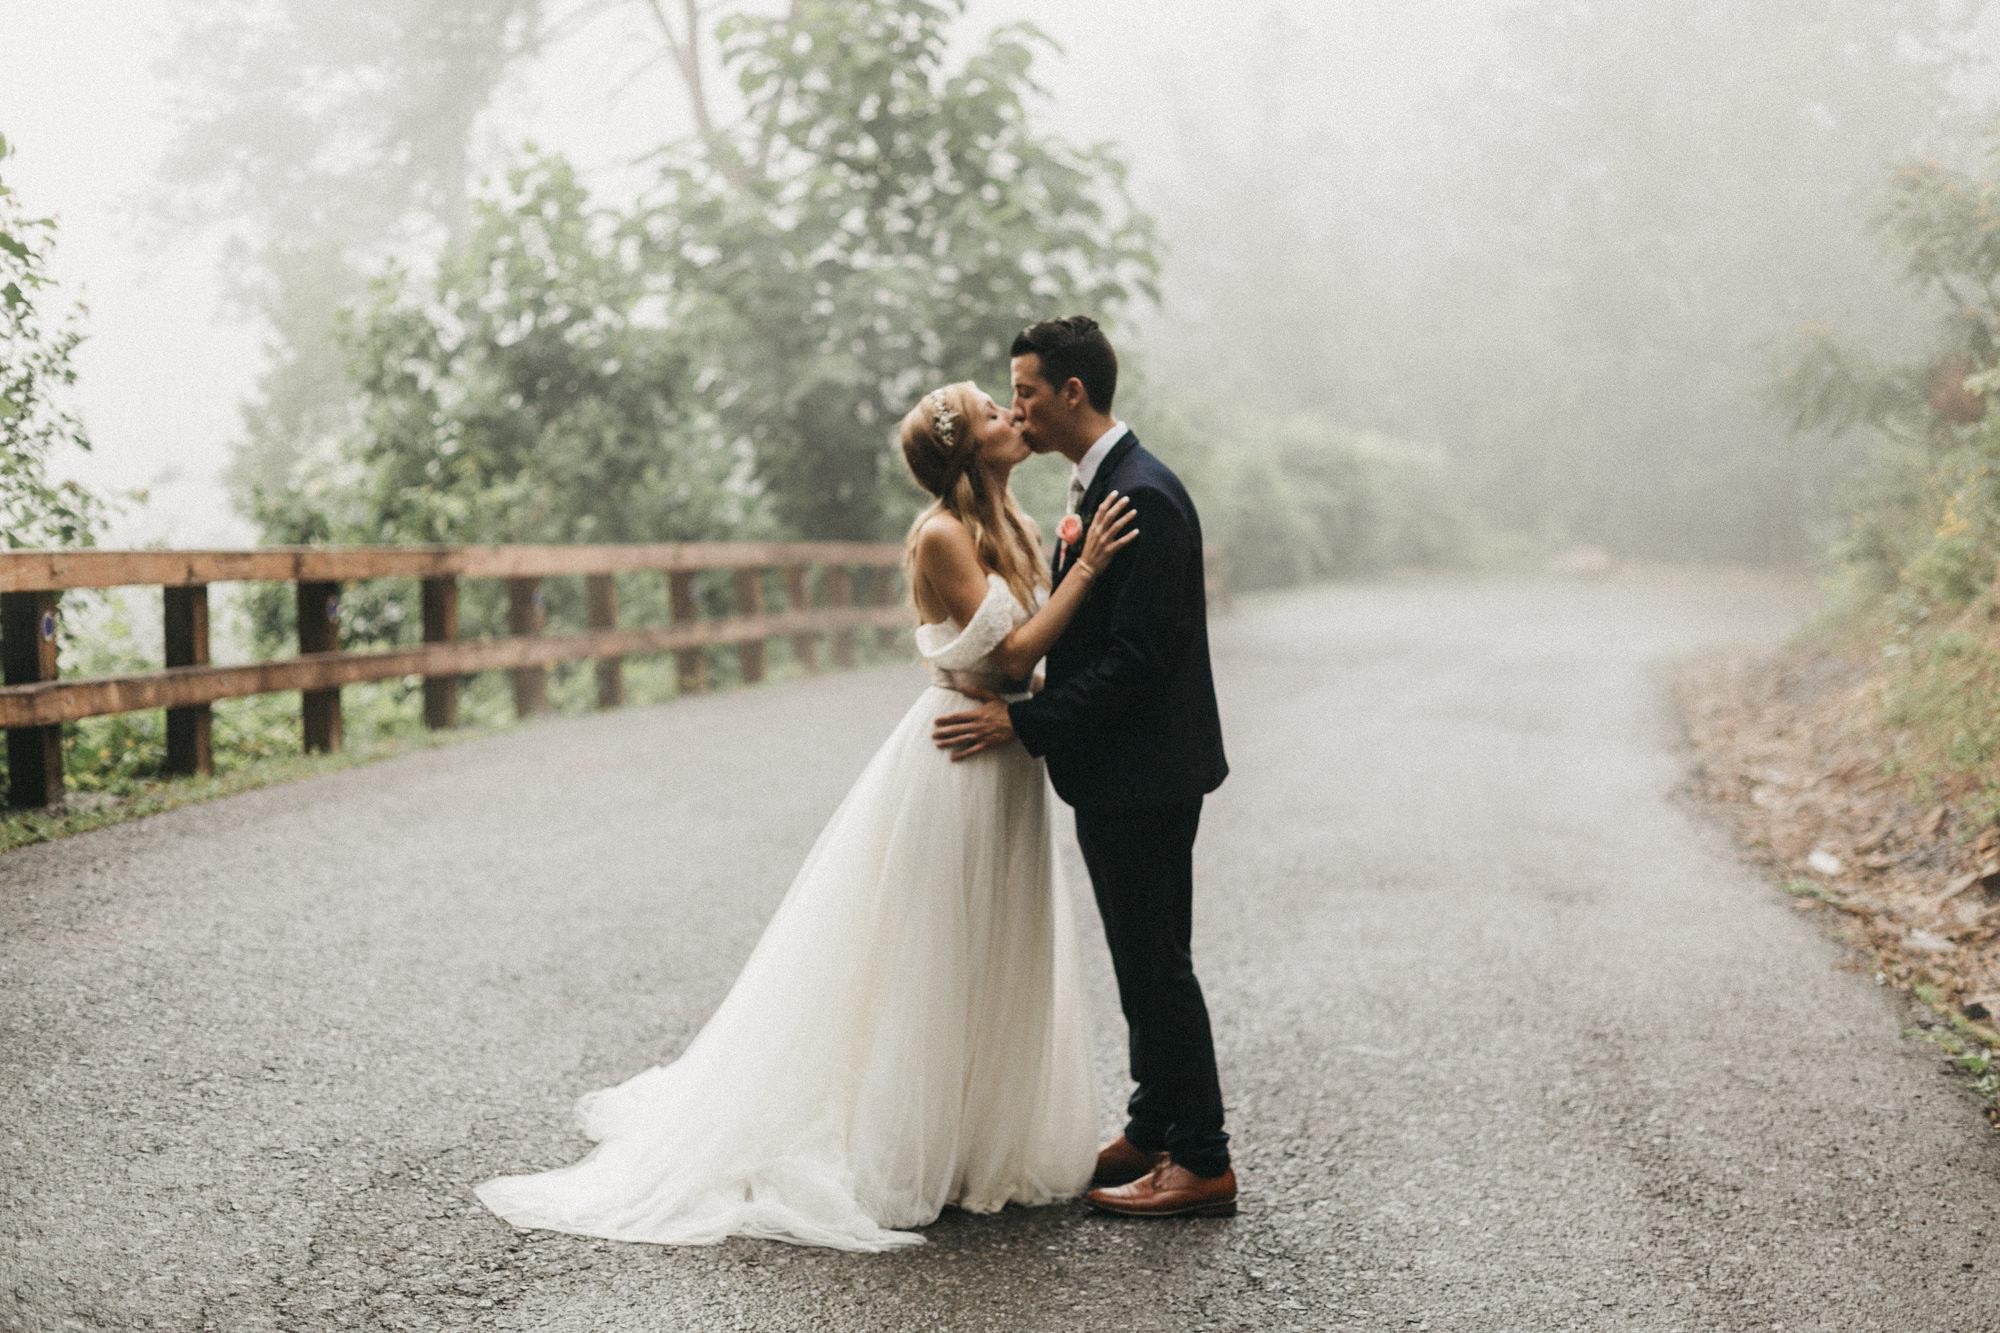 nashville_tennessee_wedding_photographer-115.jpg